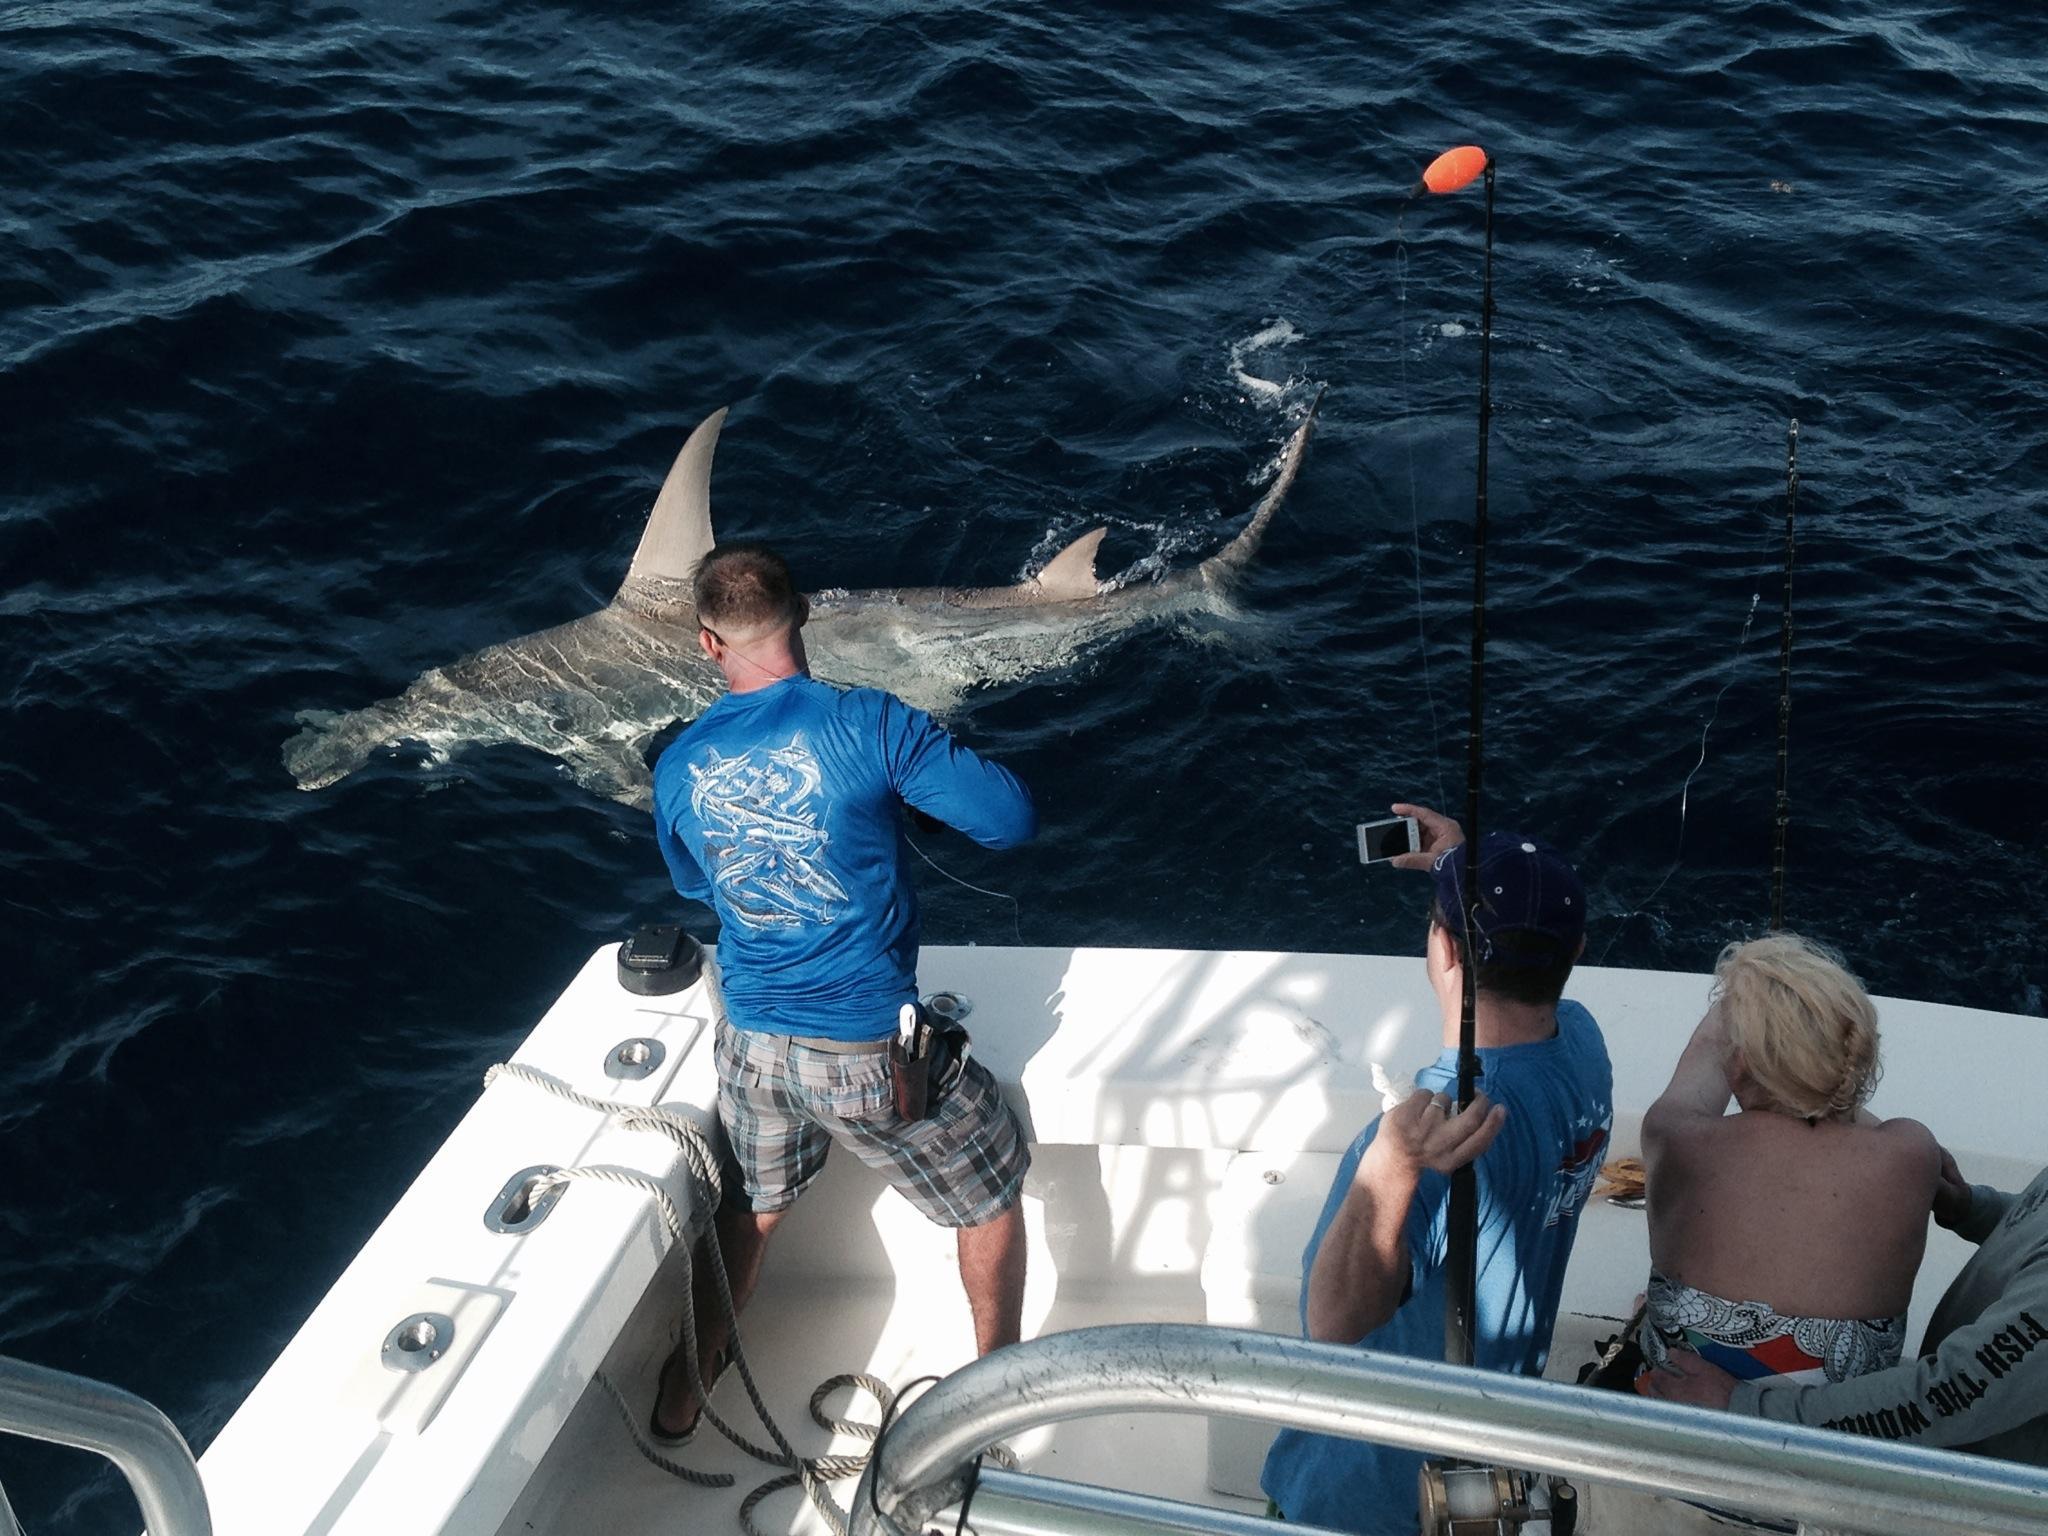 Giant Hammerhead Shark Caught- Shark Fishing Season is Here